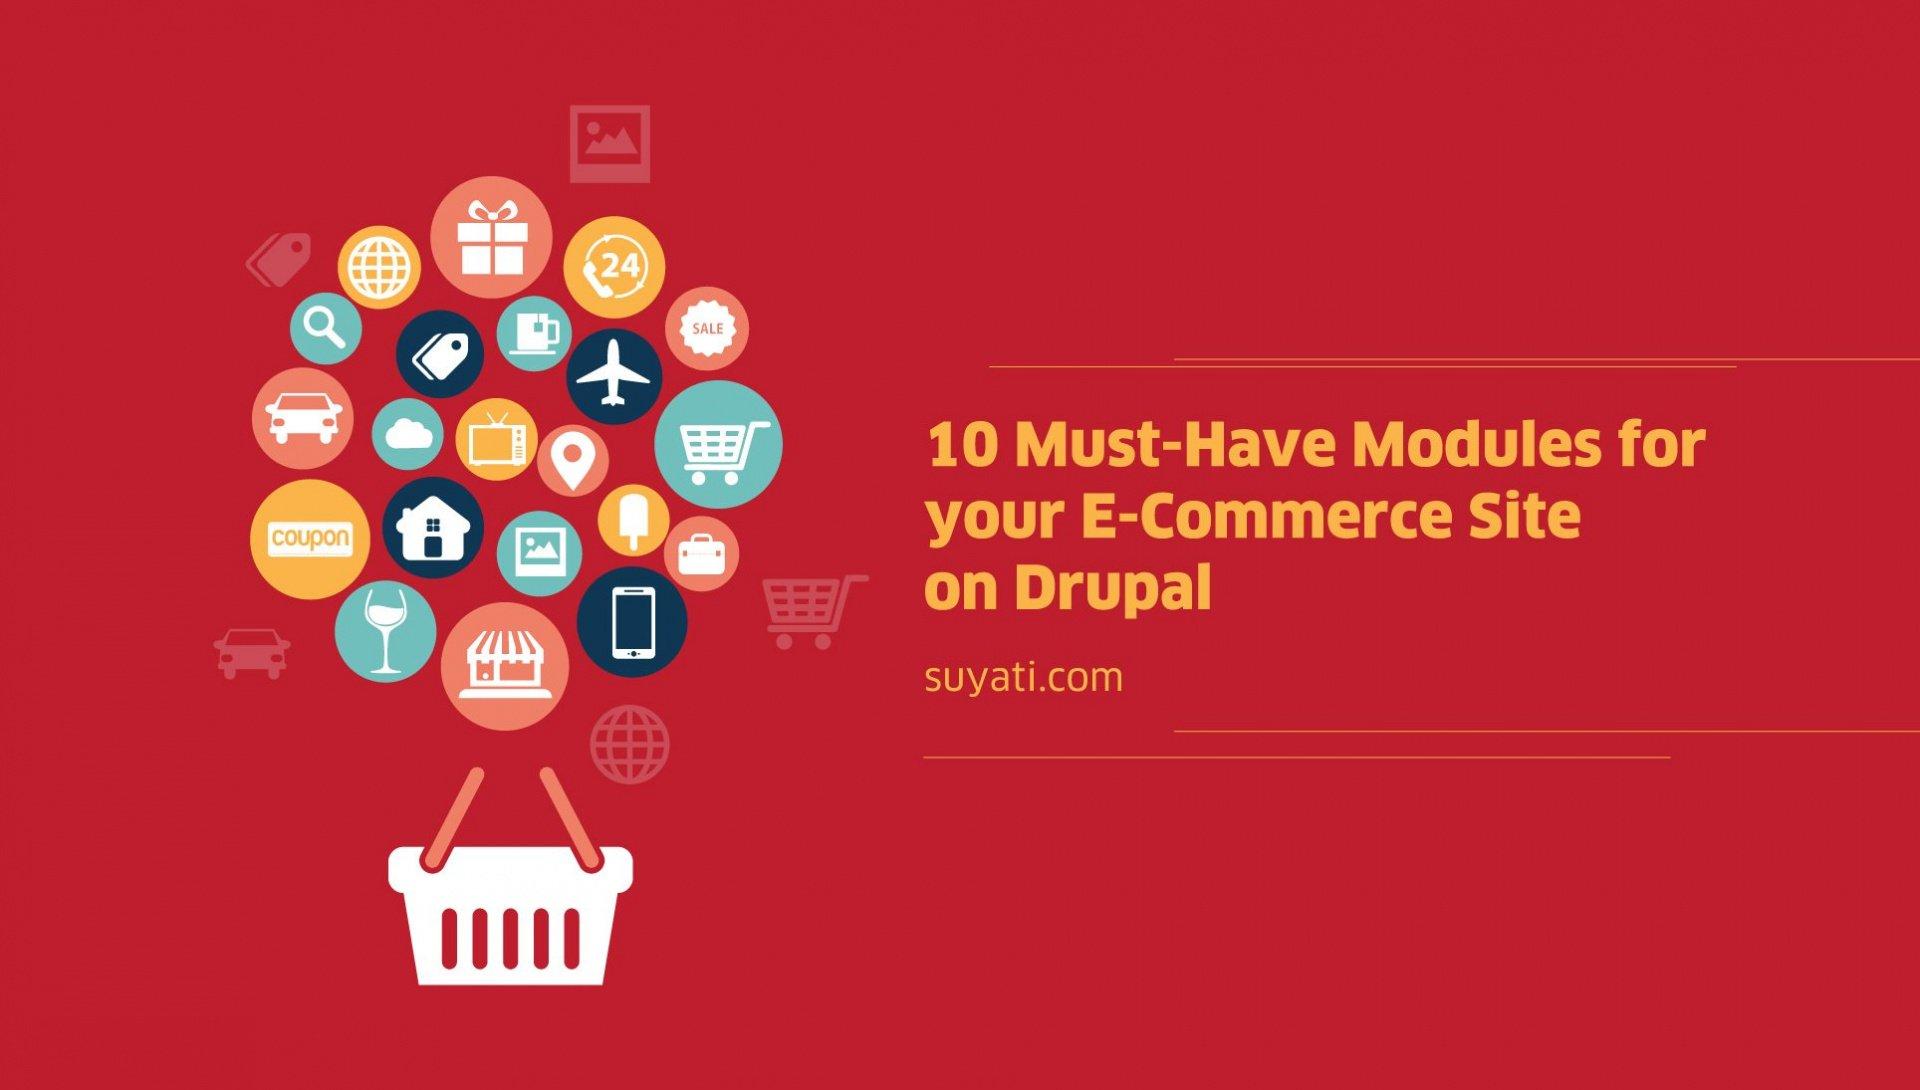 10 ecommerce solutions for your Drupal website